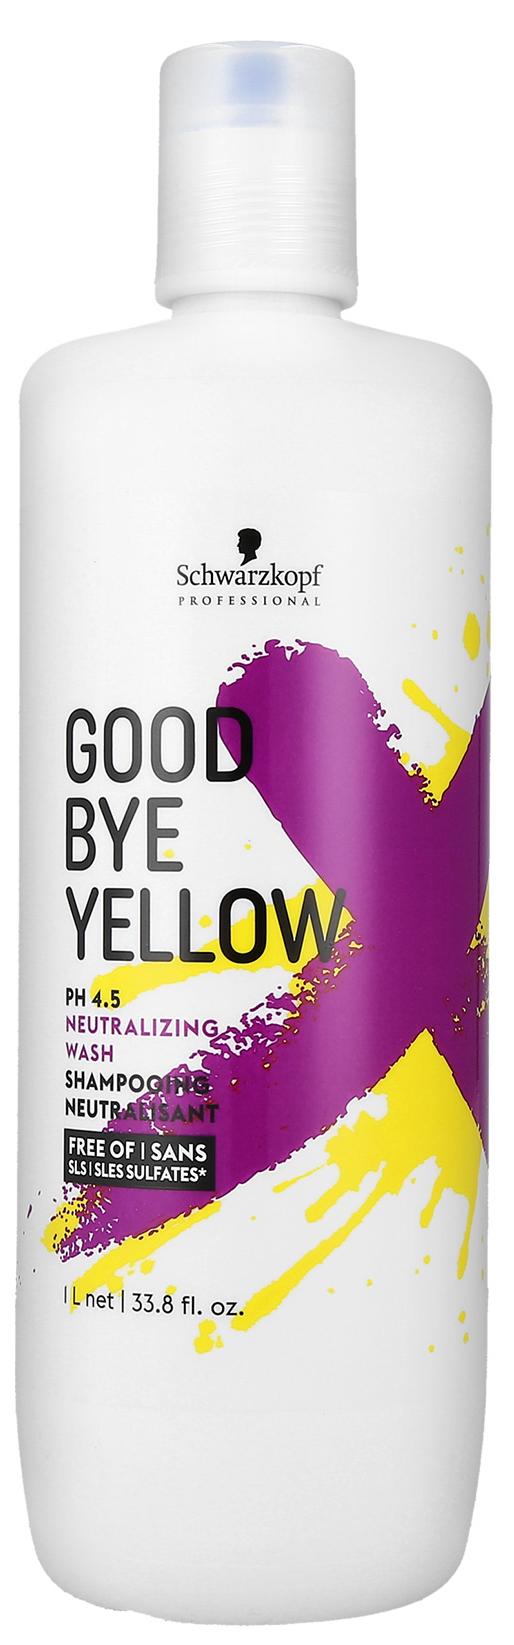 Купить Шампунь Schwarzkopf Professional Goodbye Yellow Shampoo 1000 мл